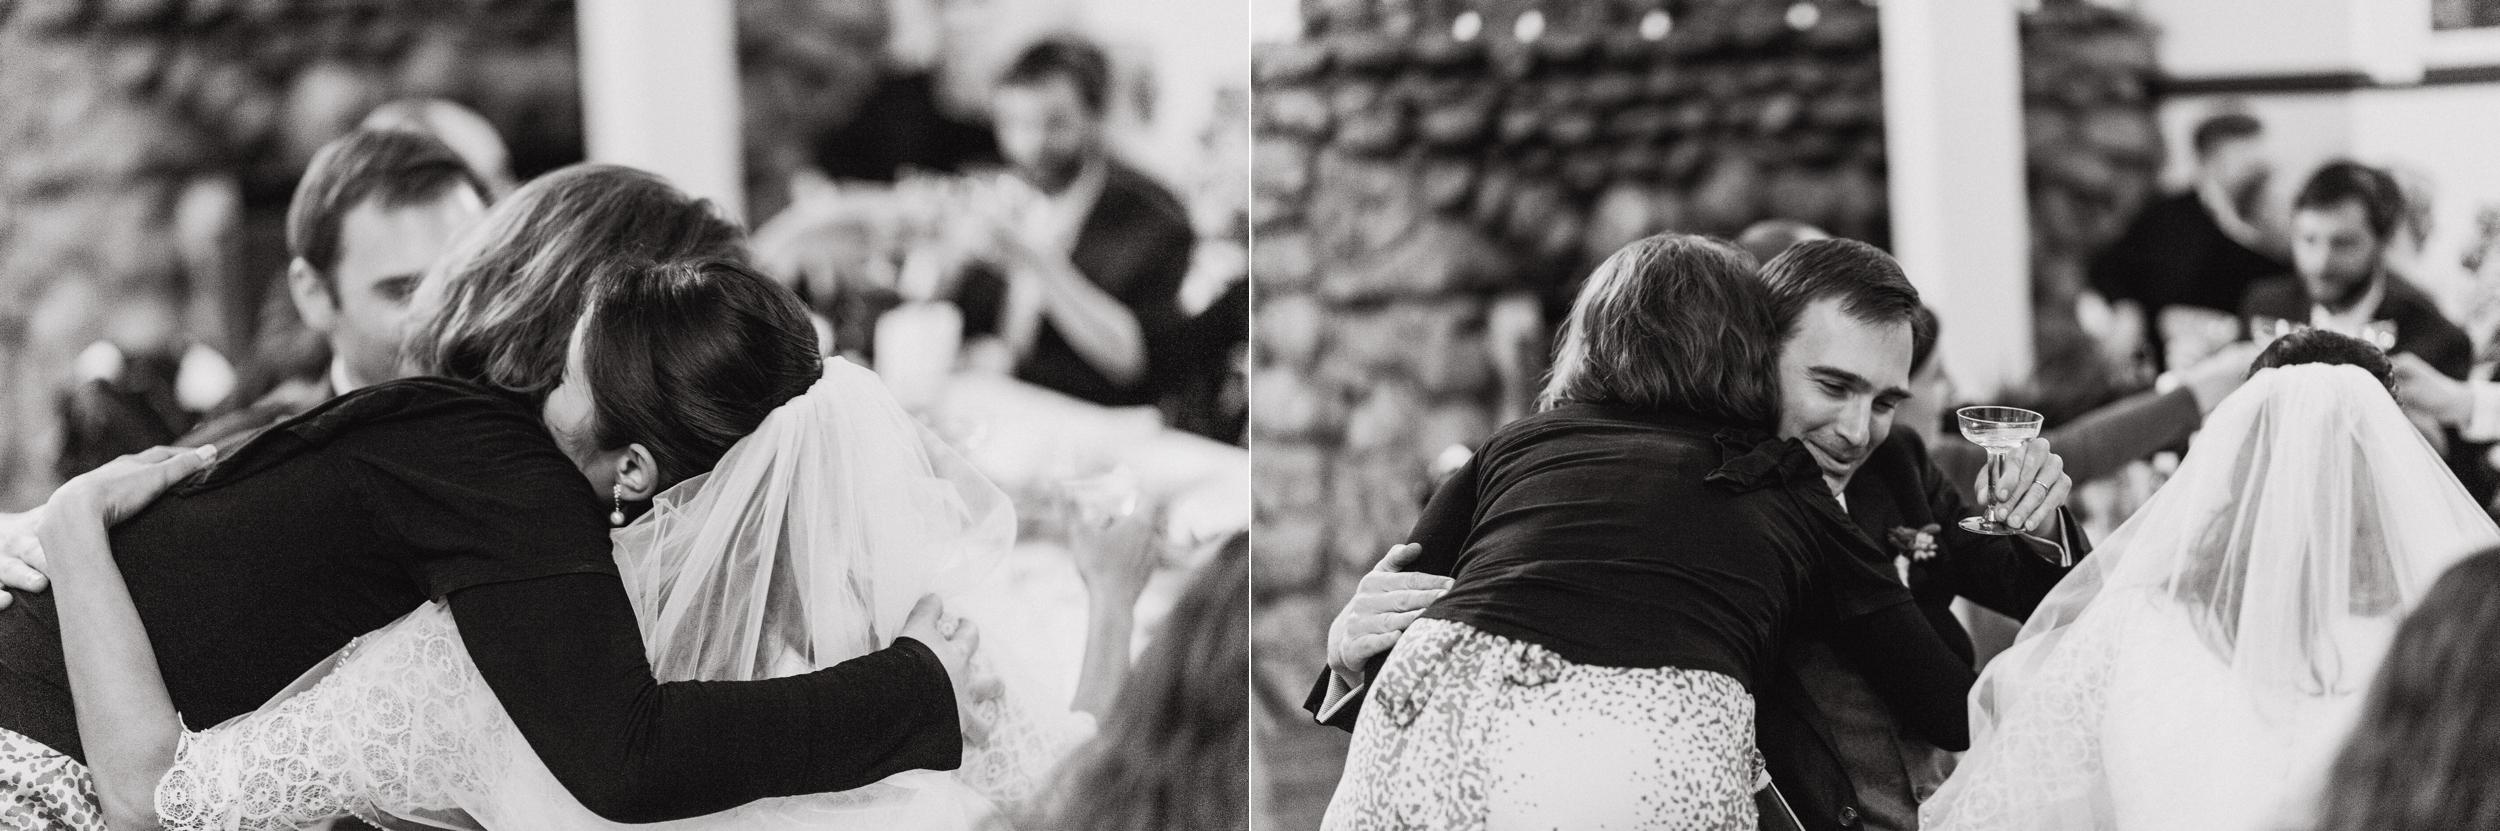 69vintage-san-francisco-stern-grove-wedding-vivianchen-0472_WEB.jpg